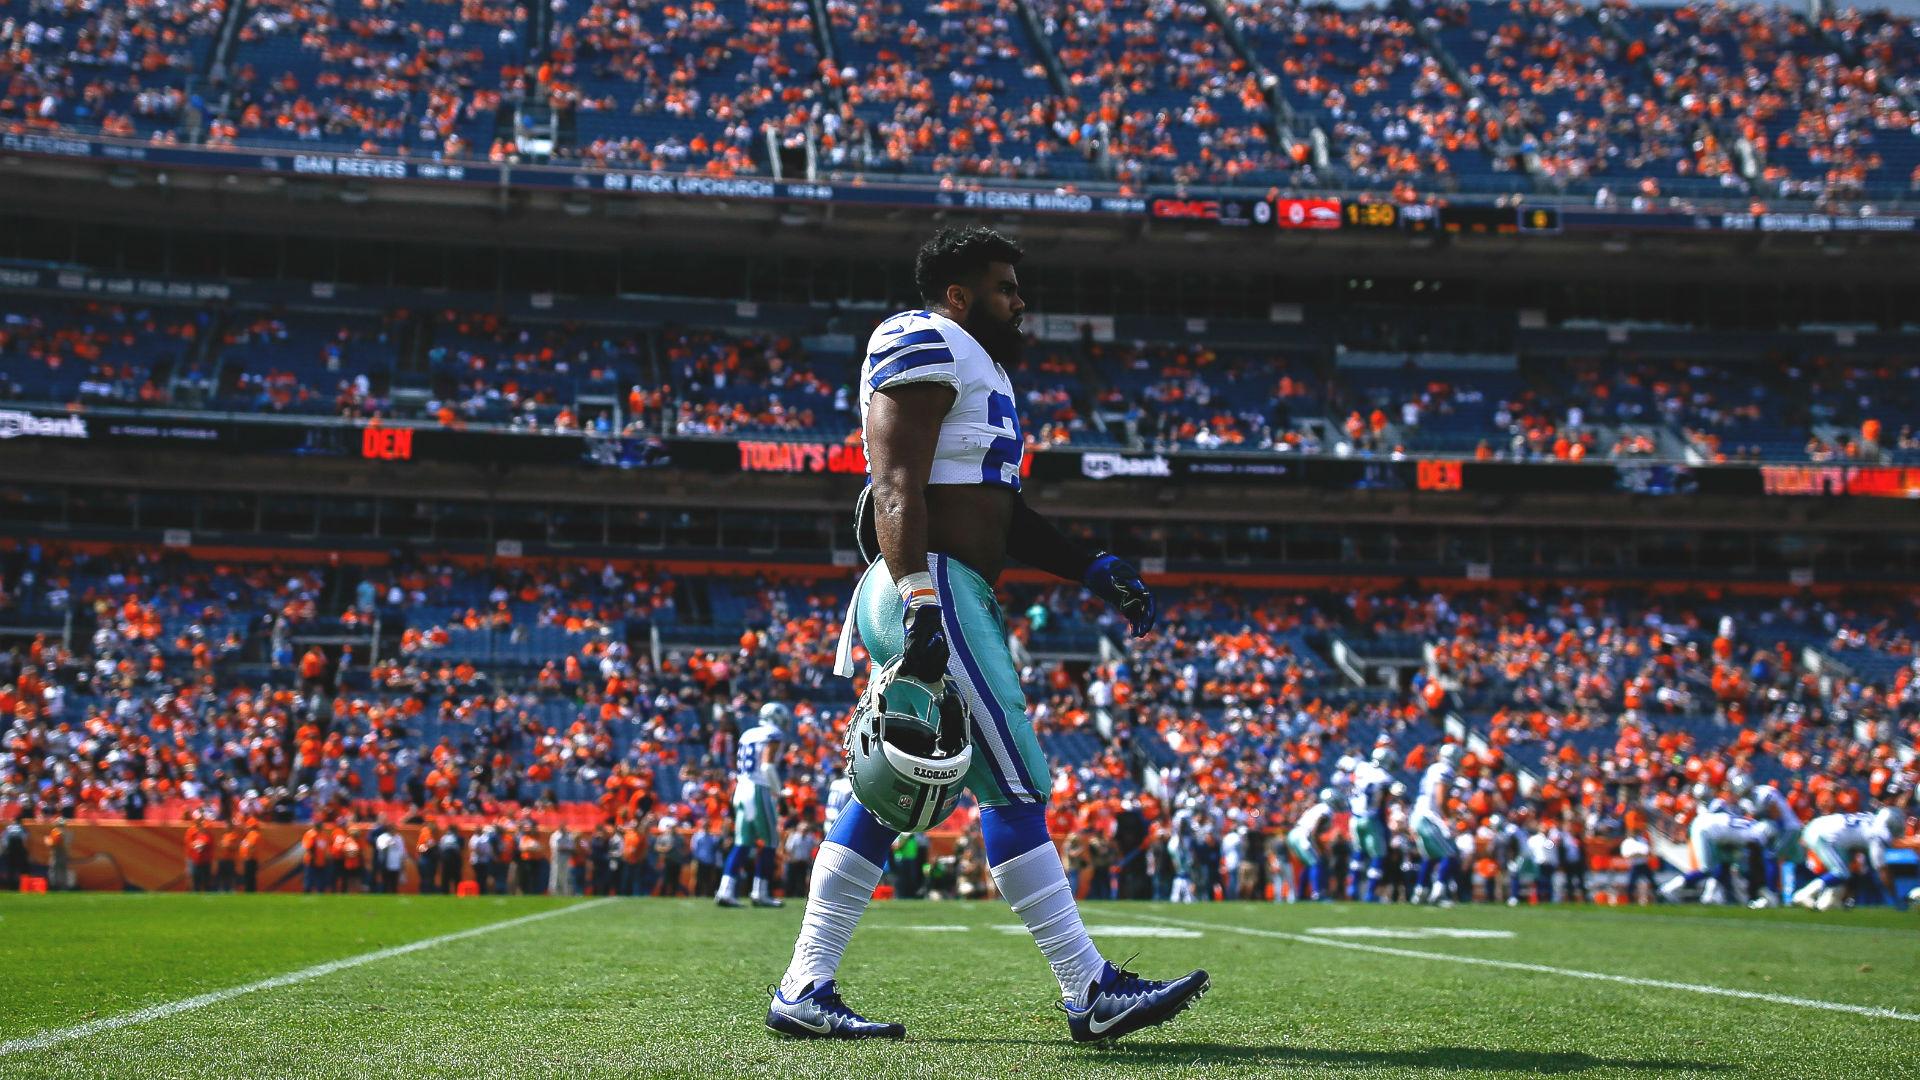 Ezekiel Elliott quit on Cowboys during loss to Broncos, critics say